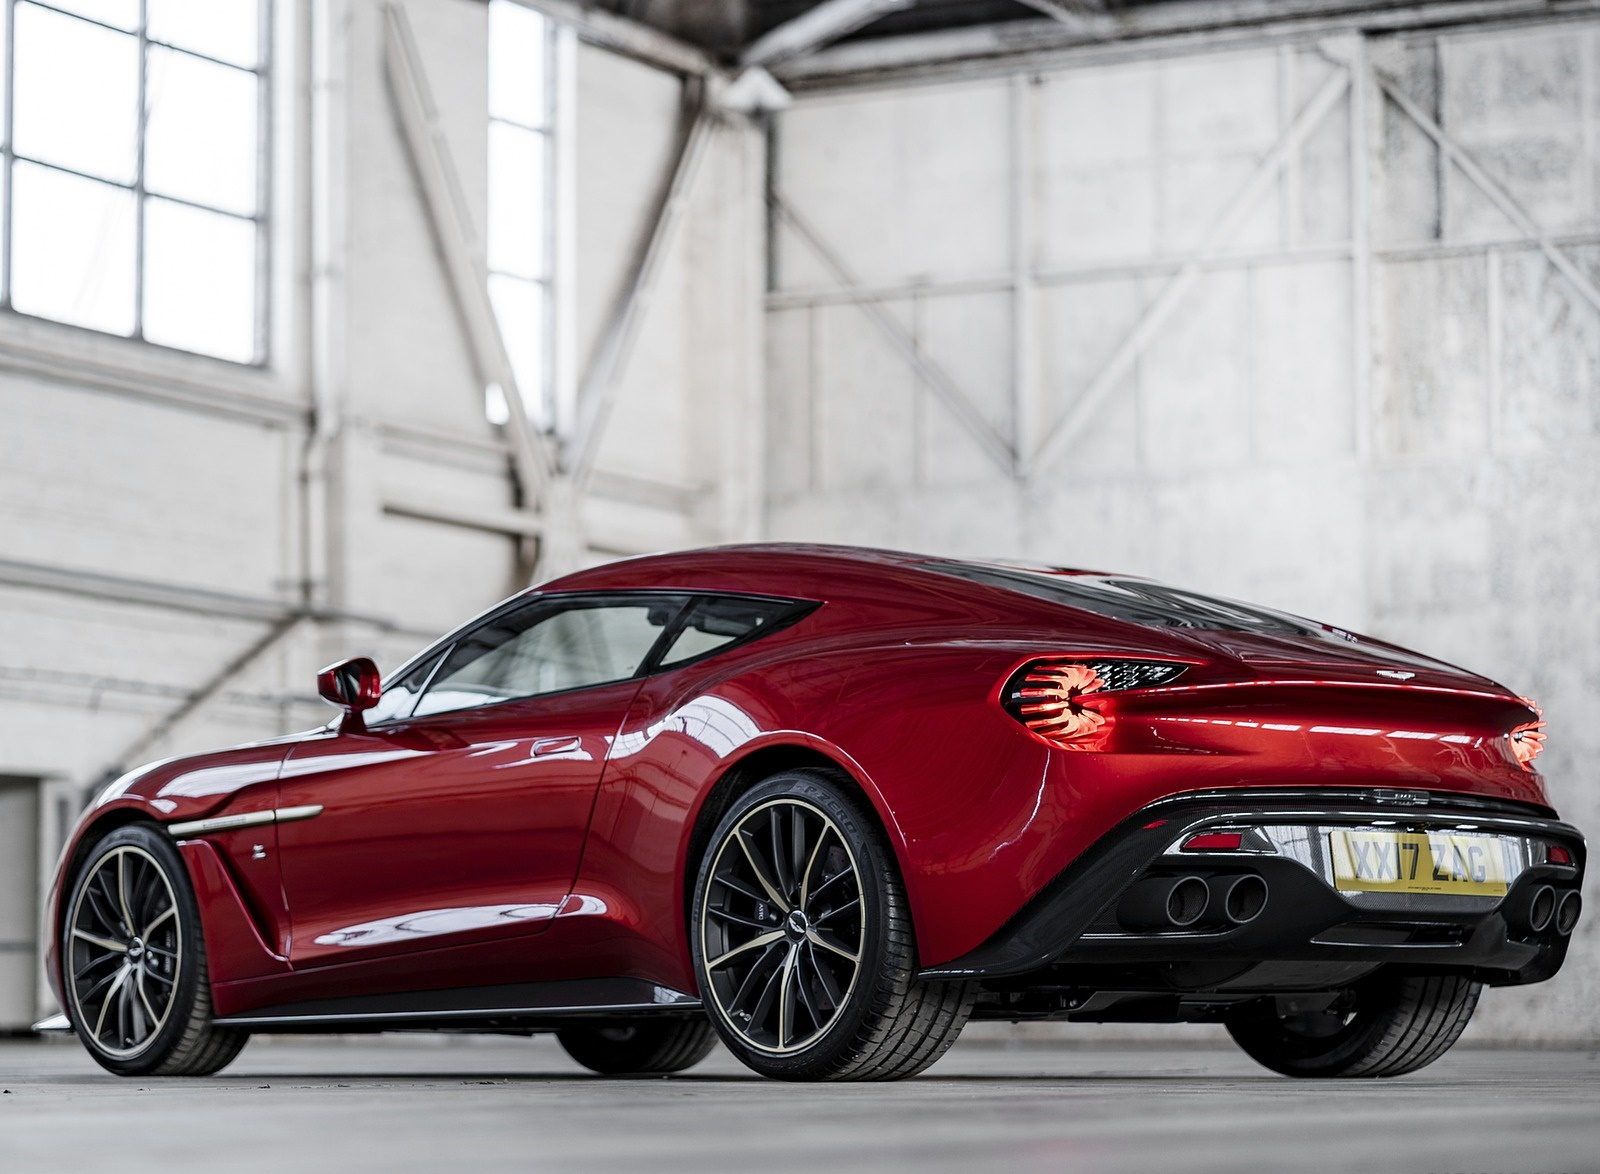 2018 Aston Martin Vanquish Zagato Coupe Rear Three Quarter Wallpapers 3 Newcarcars